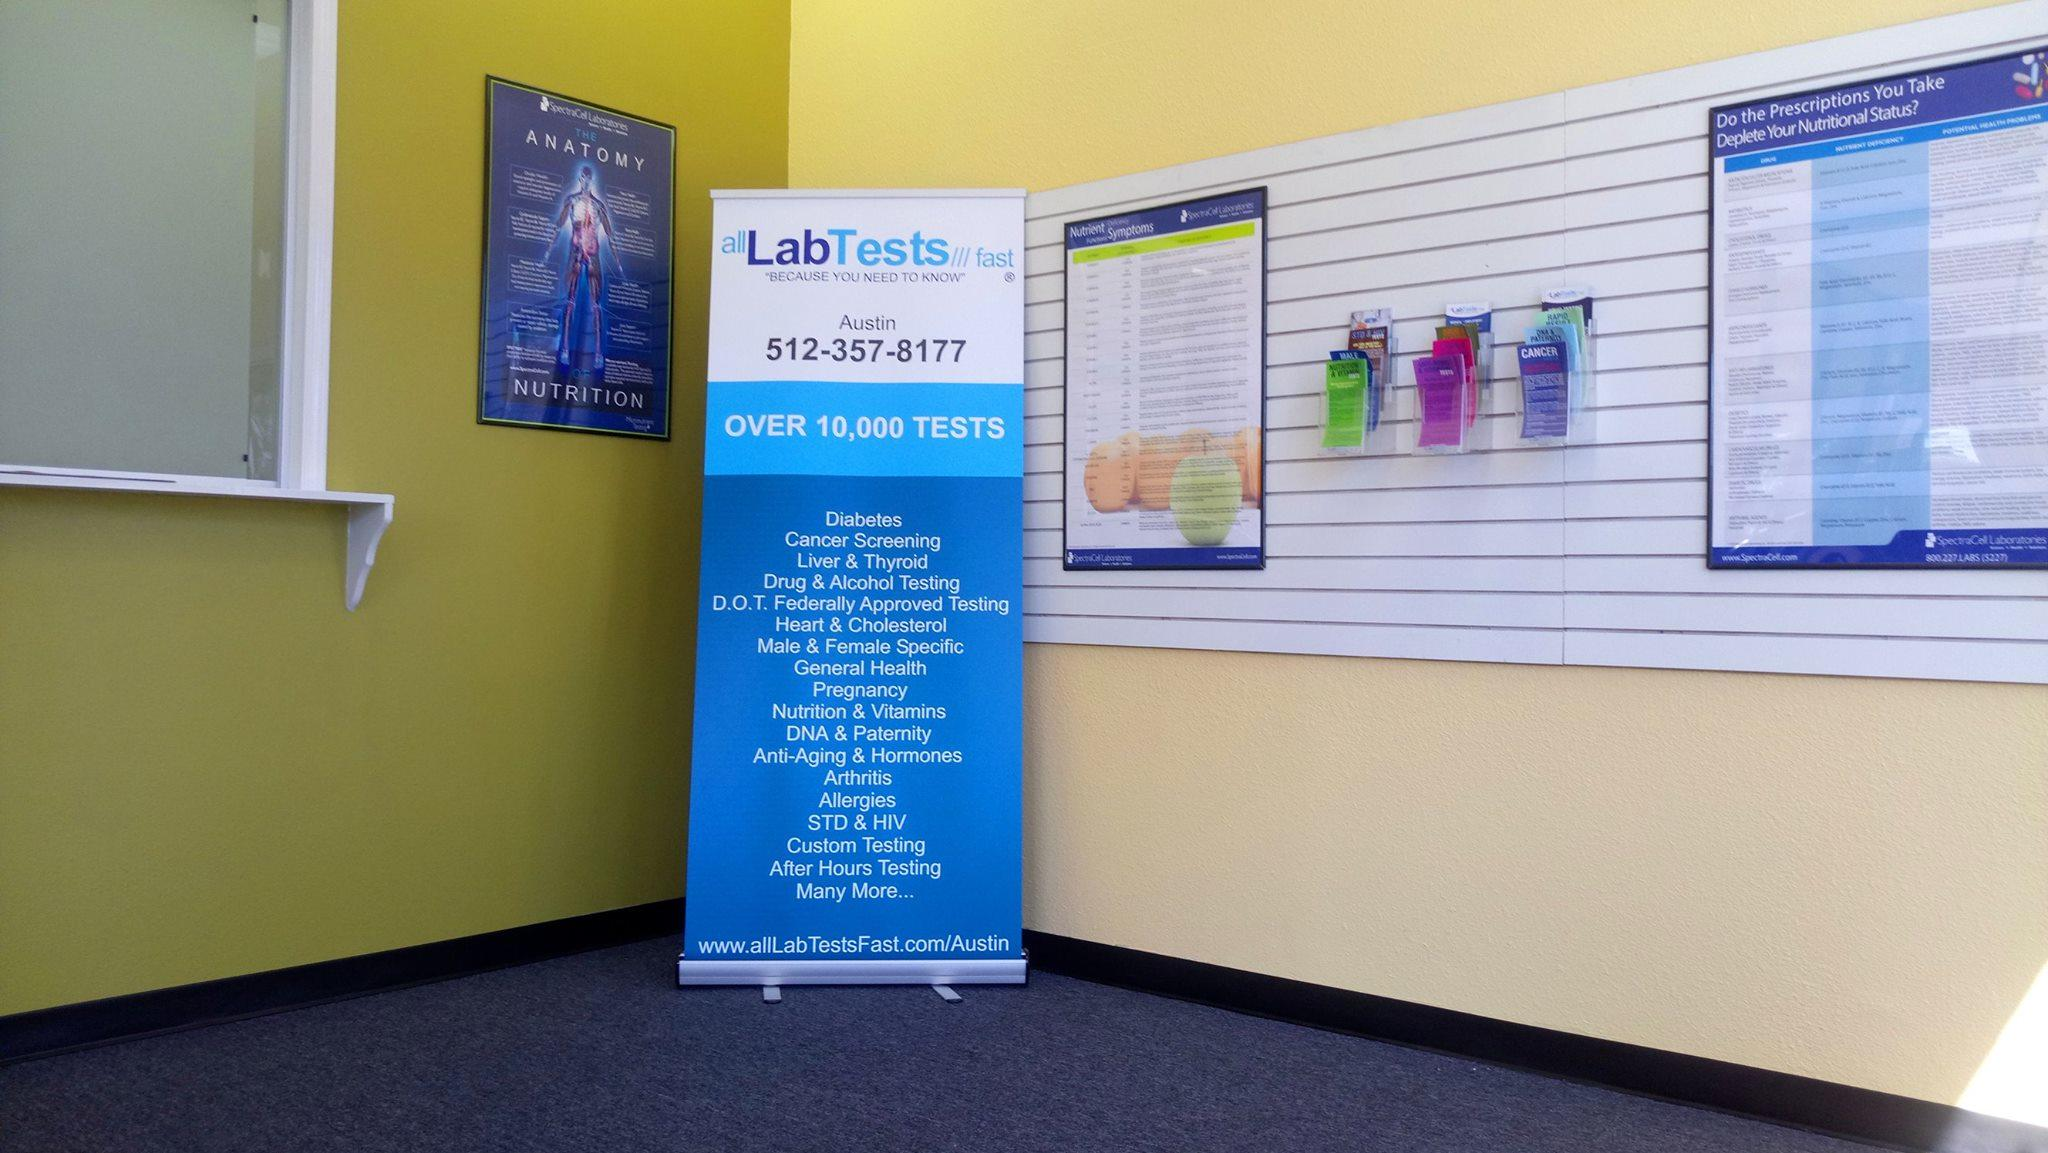 All Lab Tests Fast